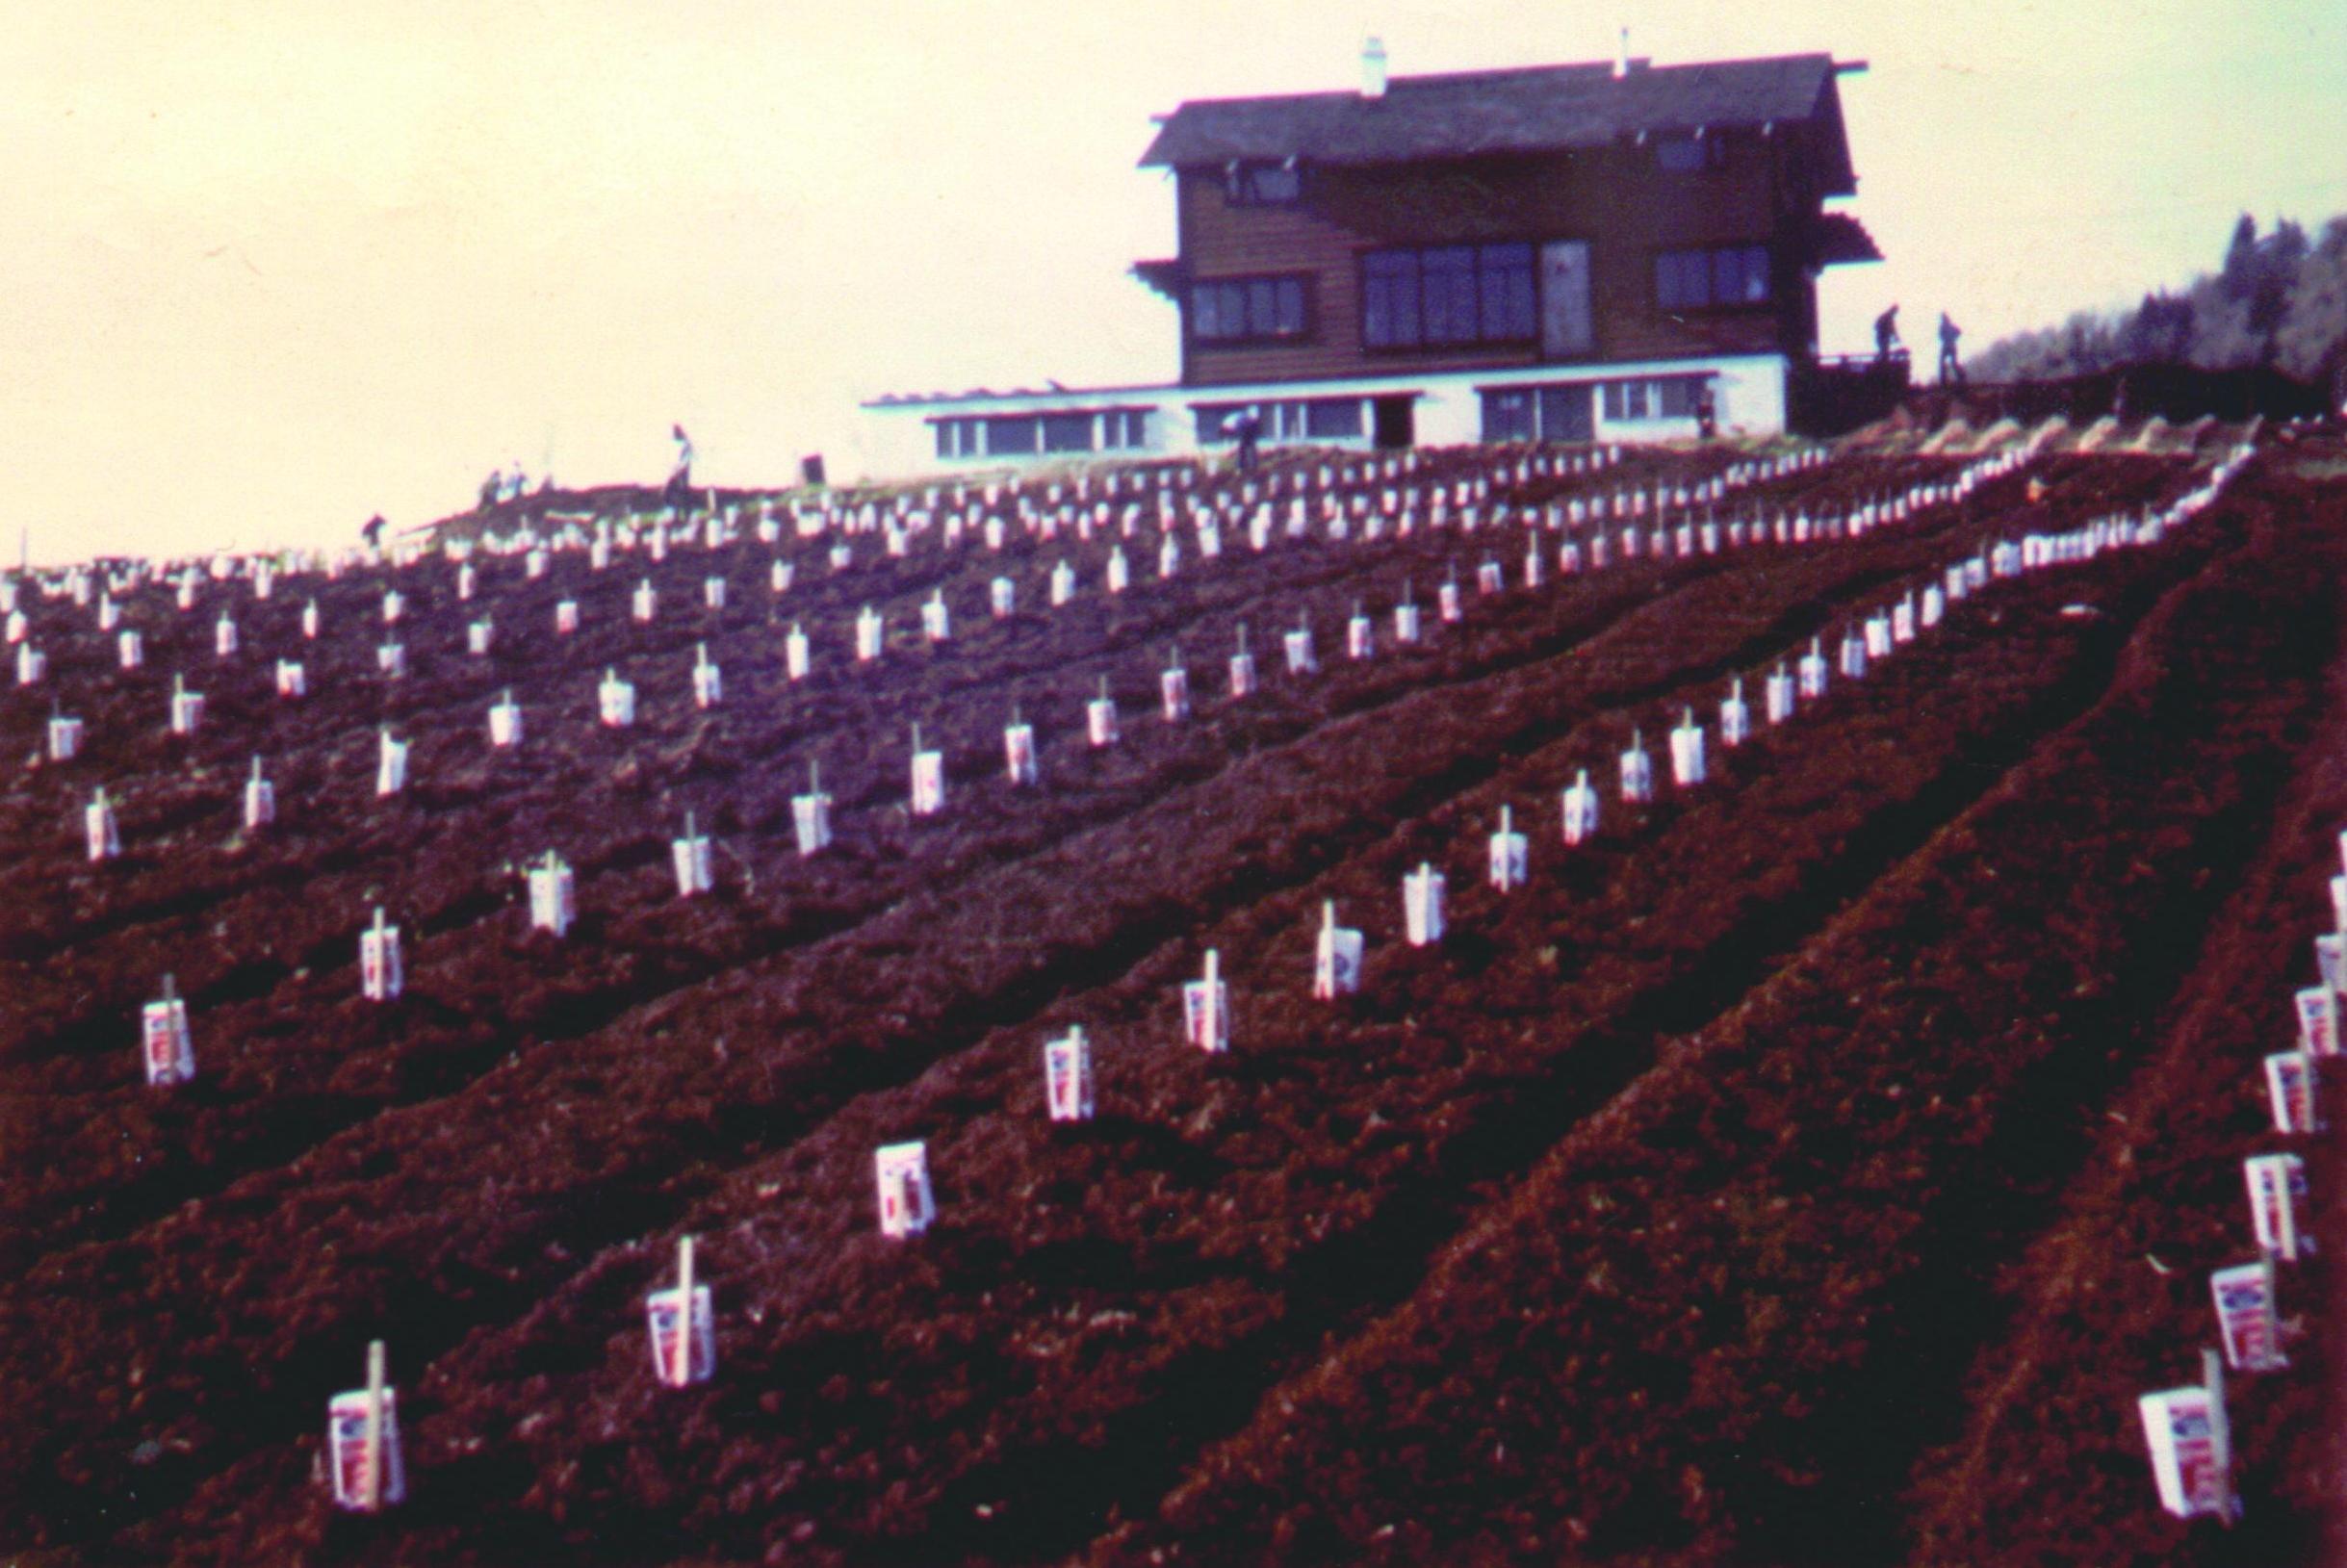 Vintage Photo of Fields in Adelsheim Vineyard